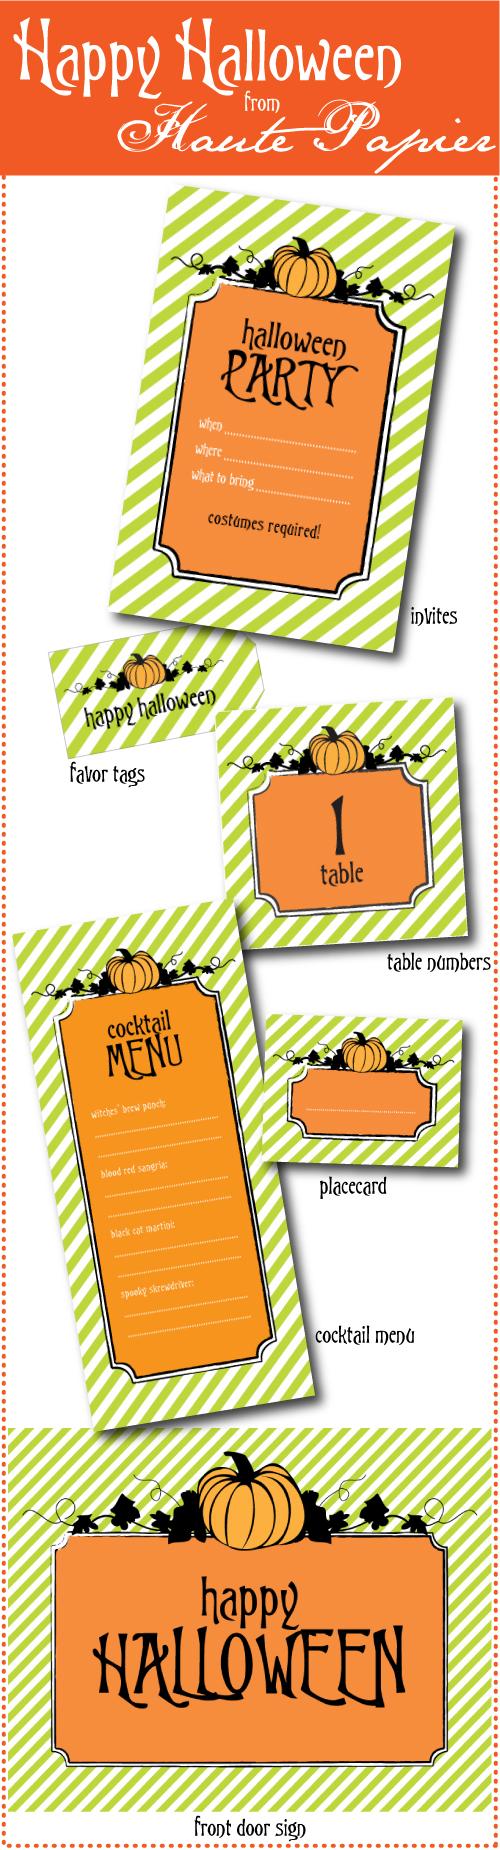 Haute_Papier_Halloween_Free_Templates